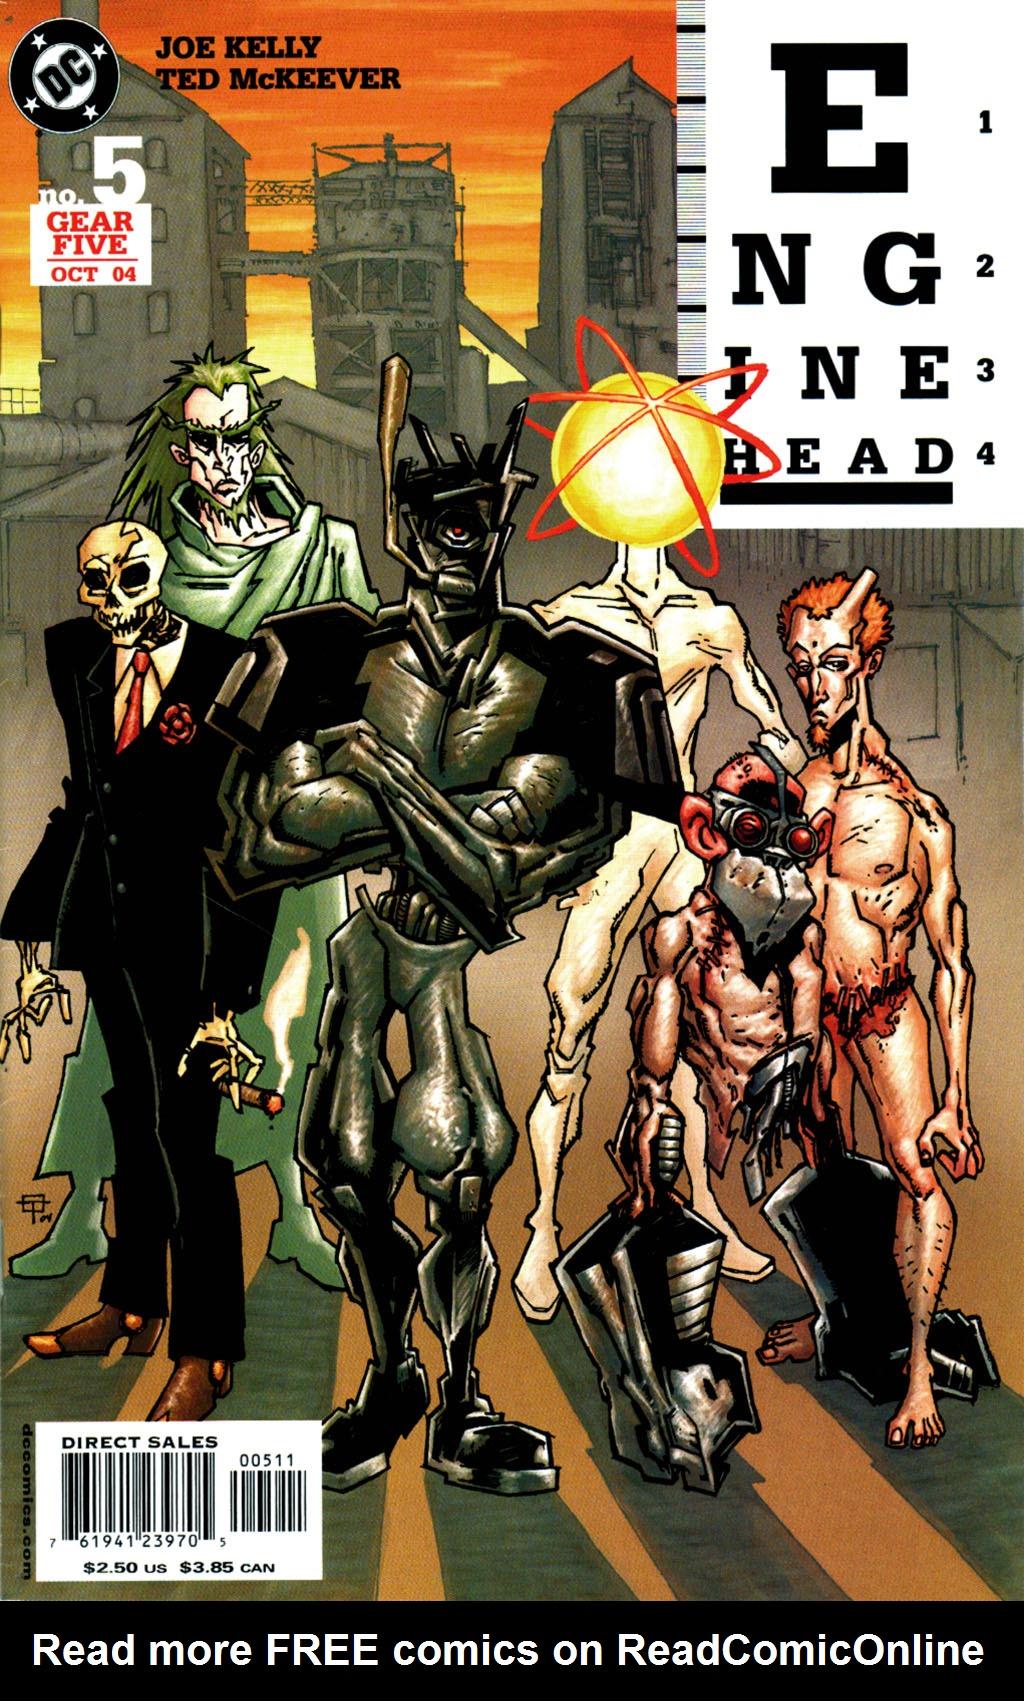 Read online Enginehead comic -  Issue #5 - 1